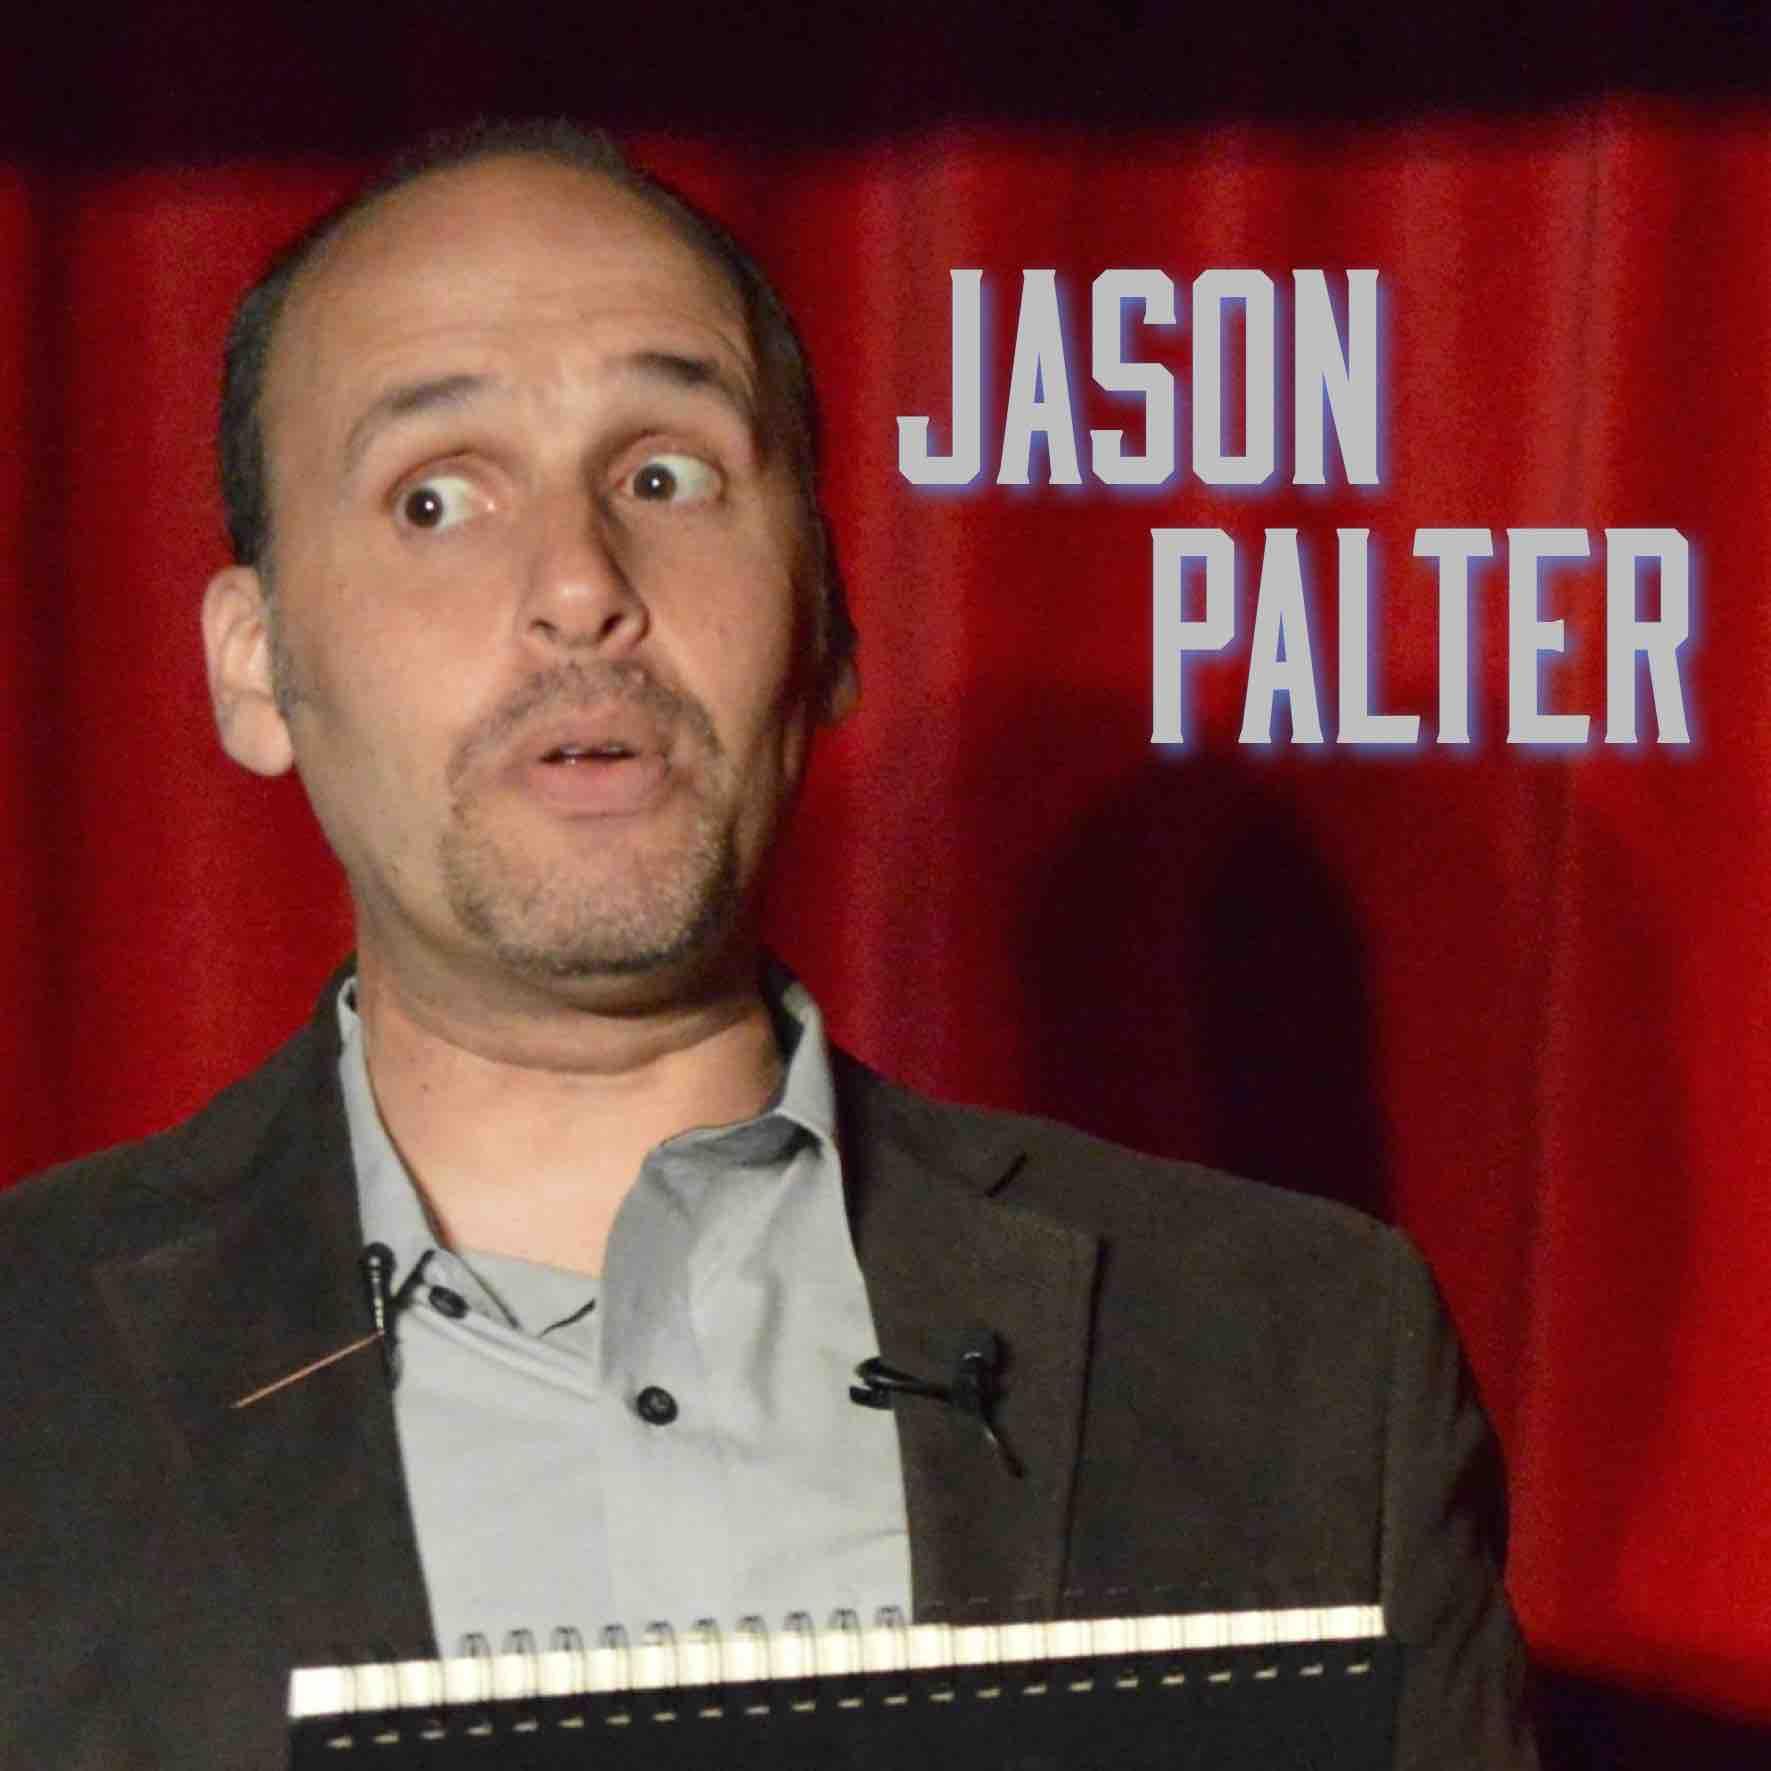 Palter-Jason.jpg